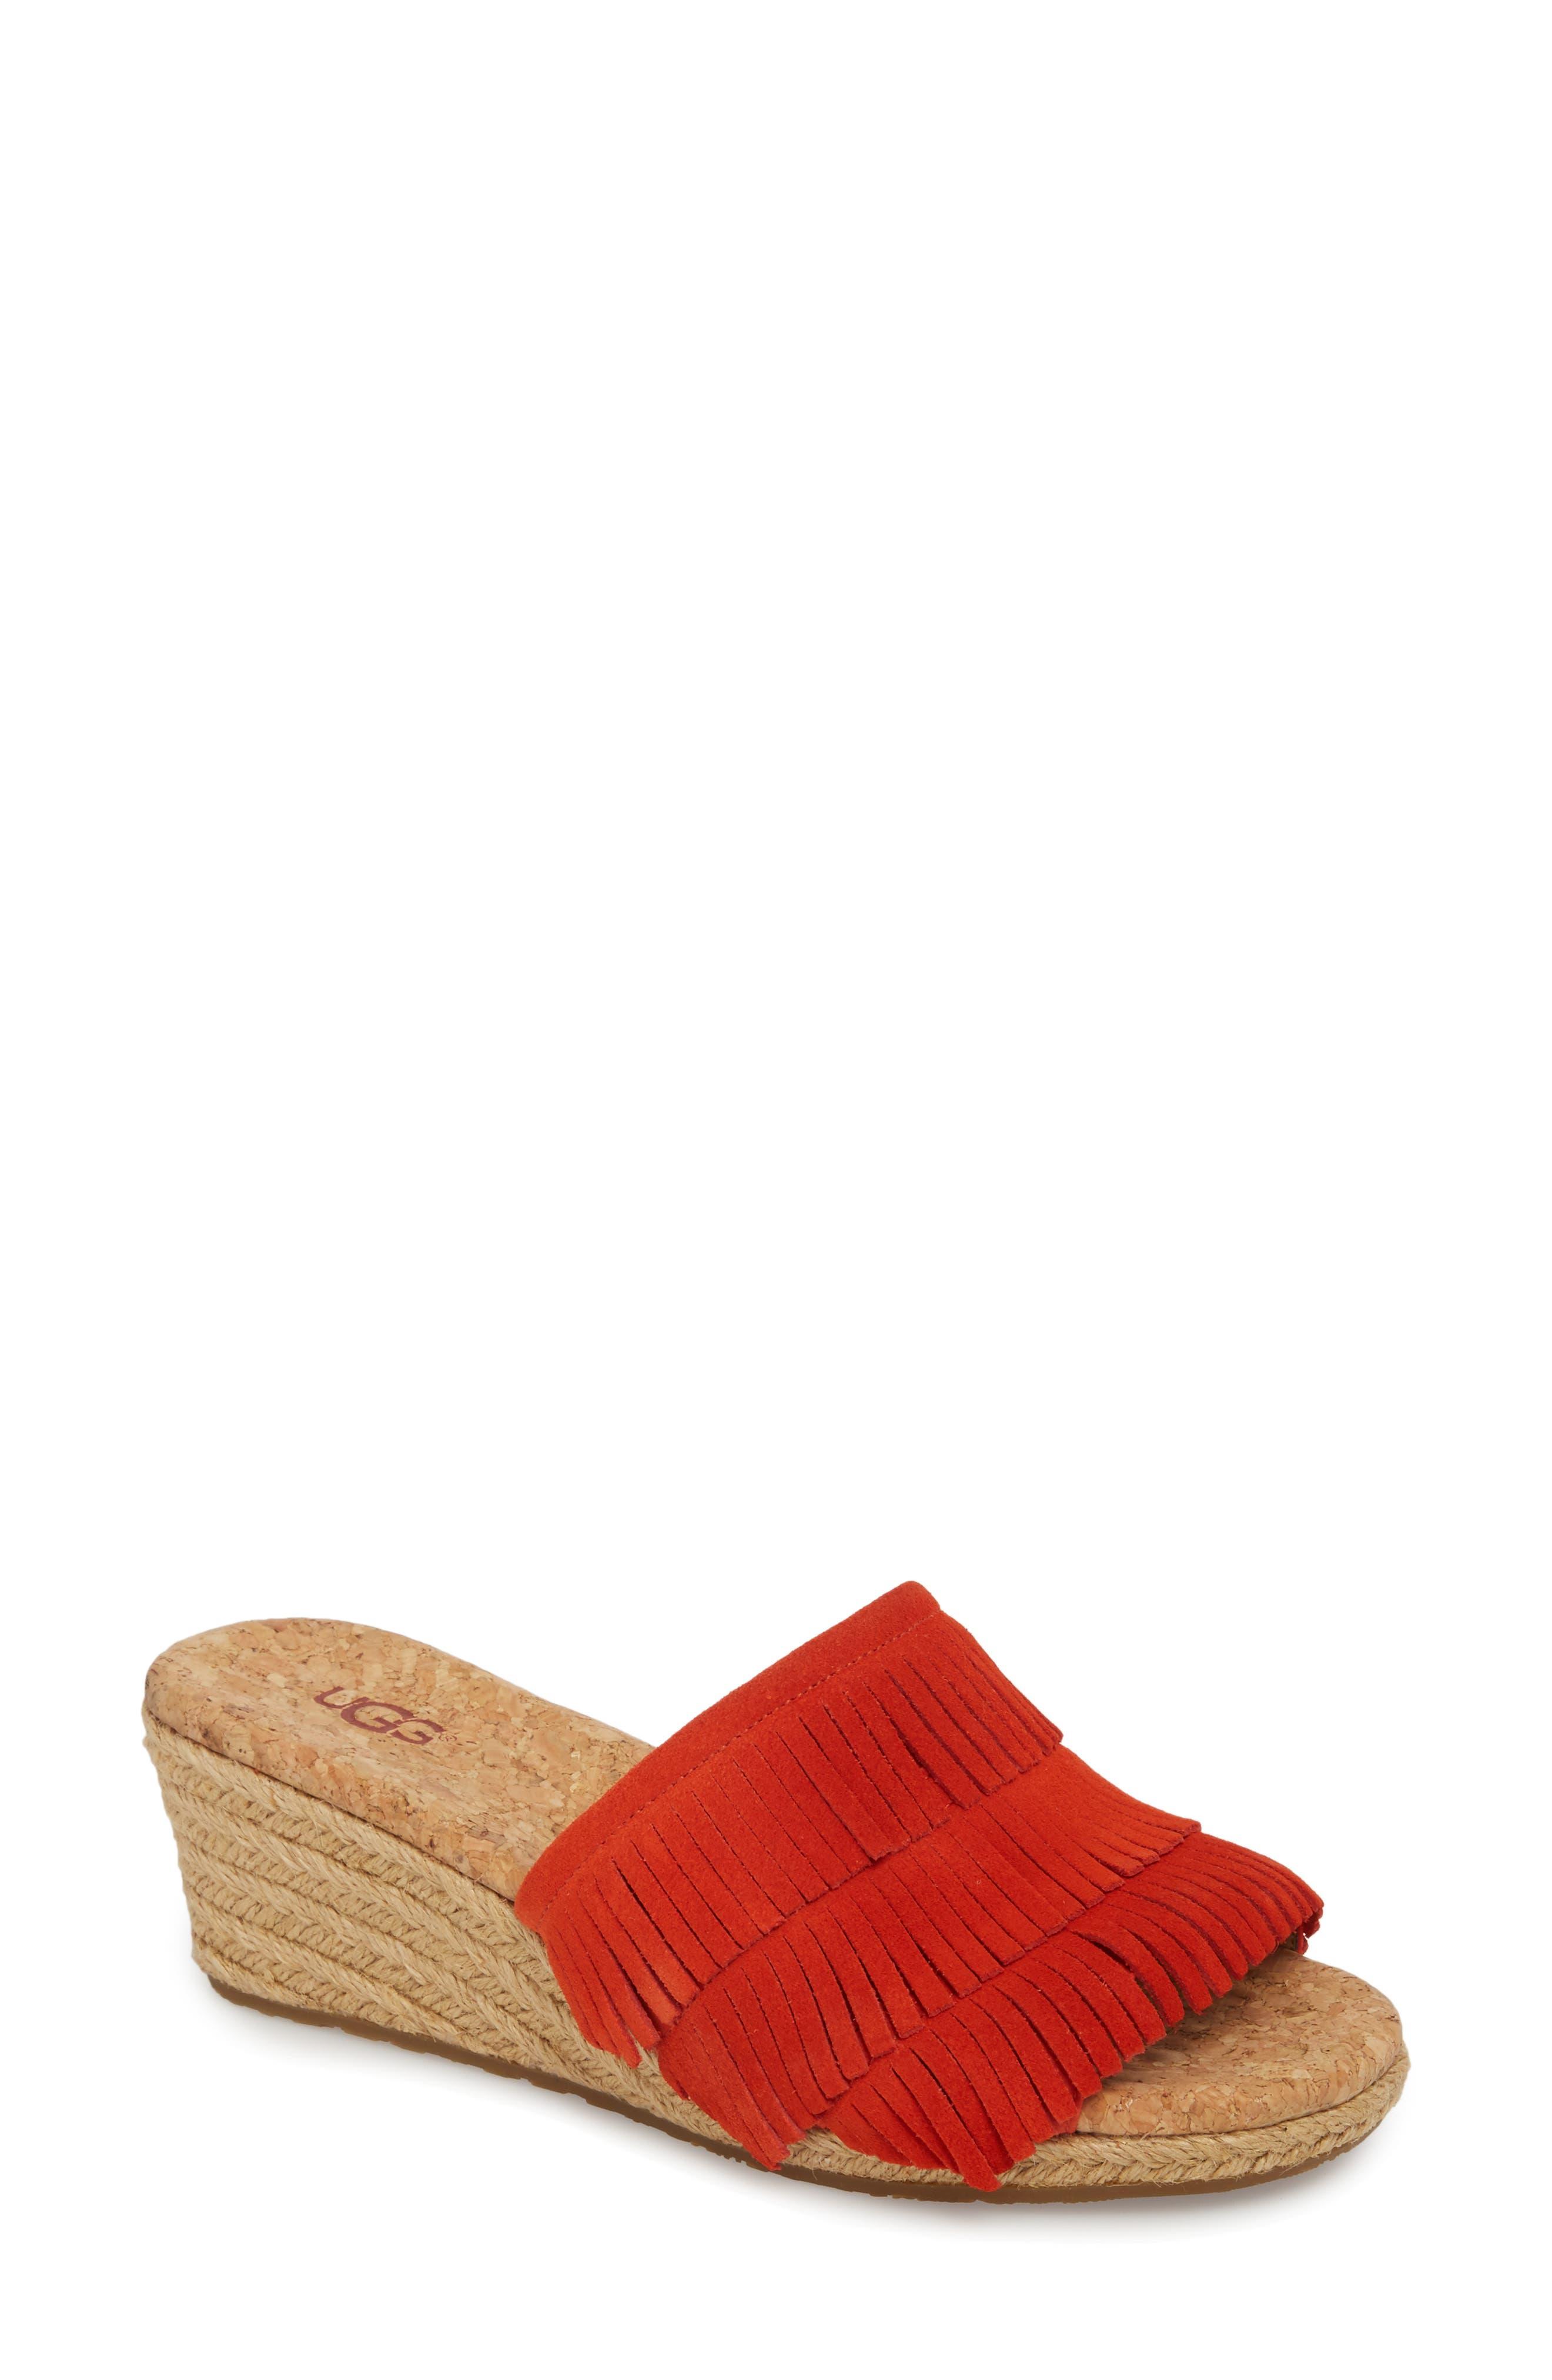 Kendra Fringe Wedge Sandal,                             Main thumbnail 1, color,                             Red Orange